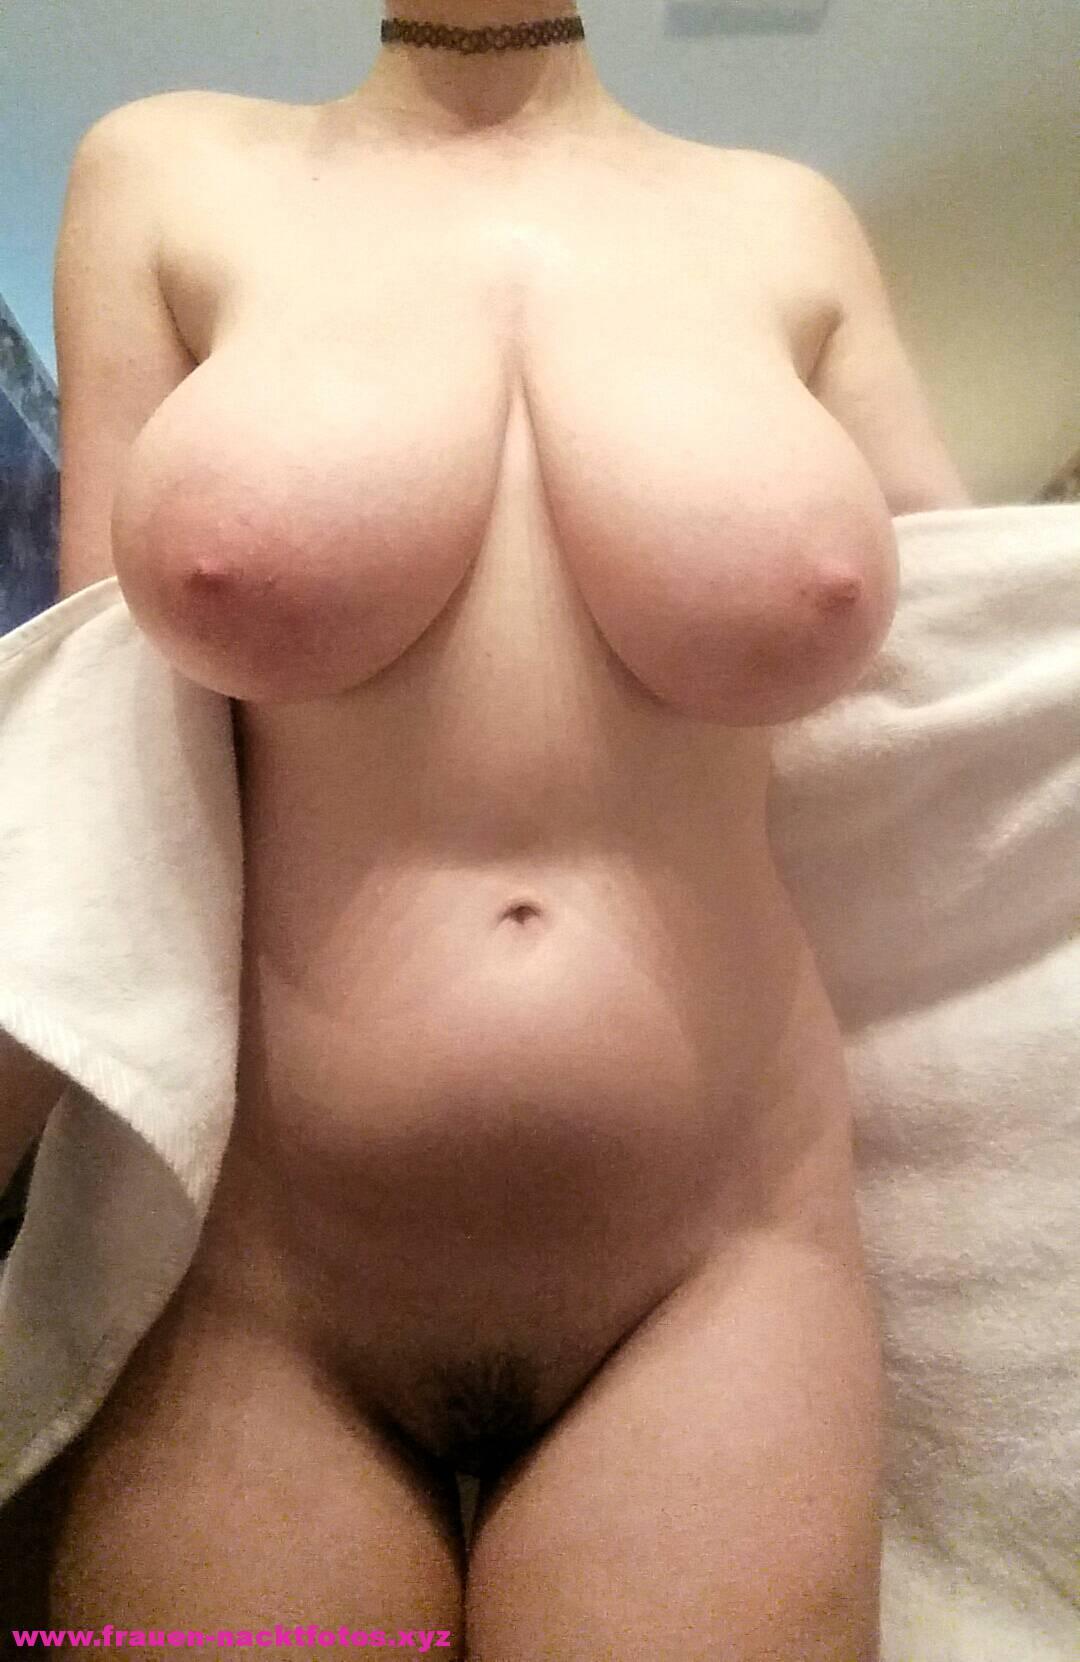 frauen nackt free nackte medels